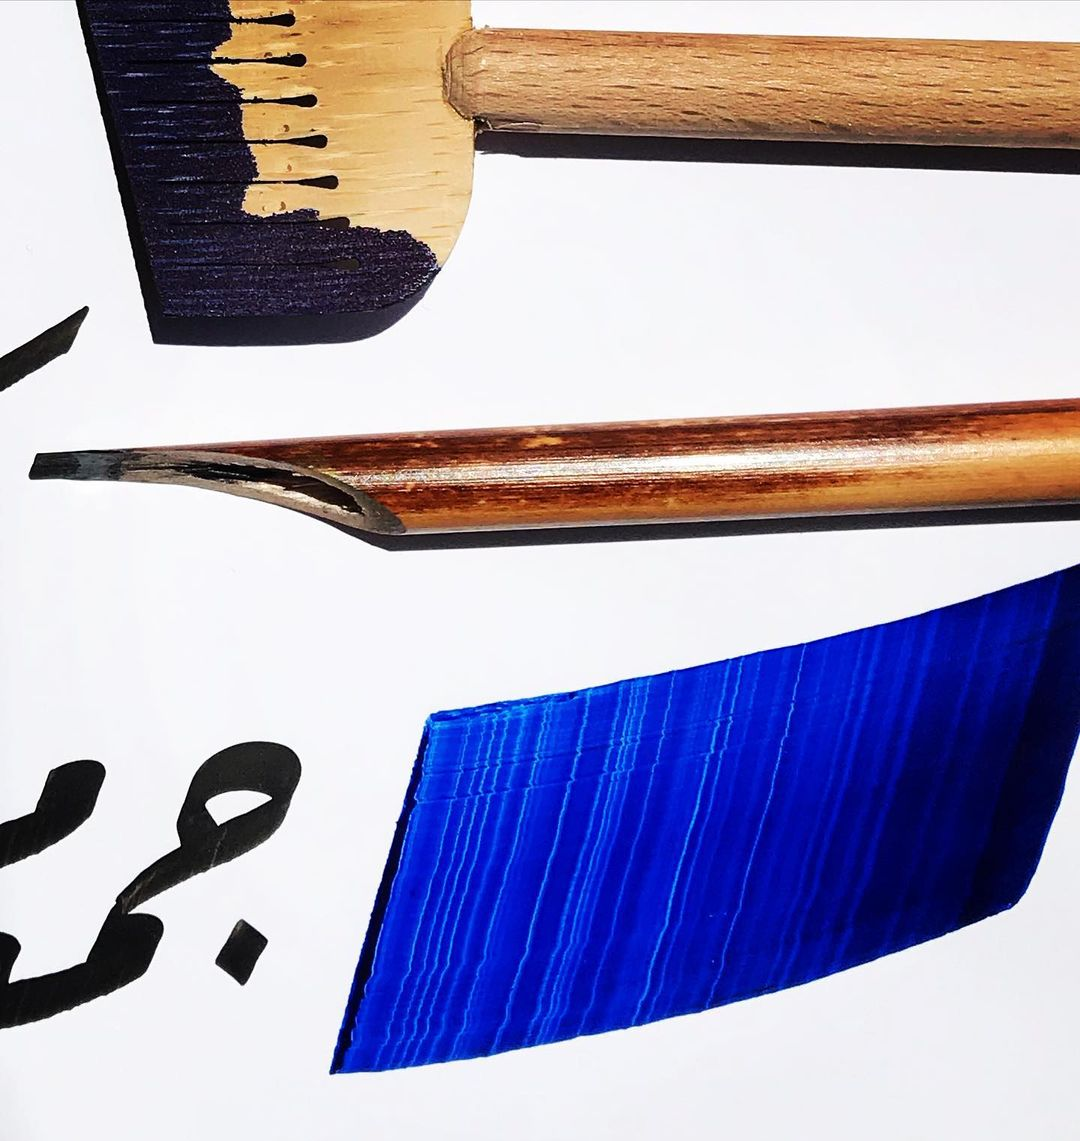 Donwload Photo #جمعة_مباركة #arabiccalligraphy #islamiccalligraphy #tezhip #hüsnühat #hüsnih...- hattat_aa 2